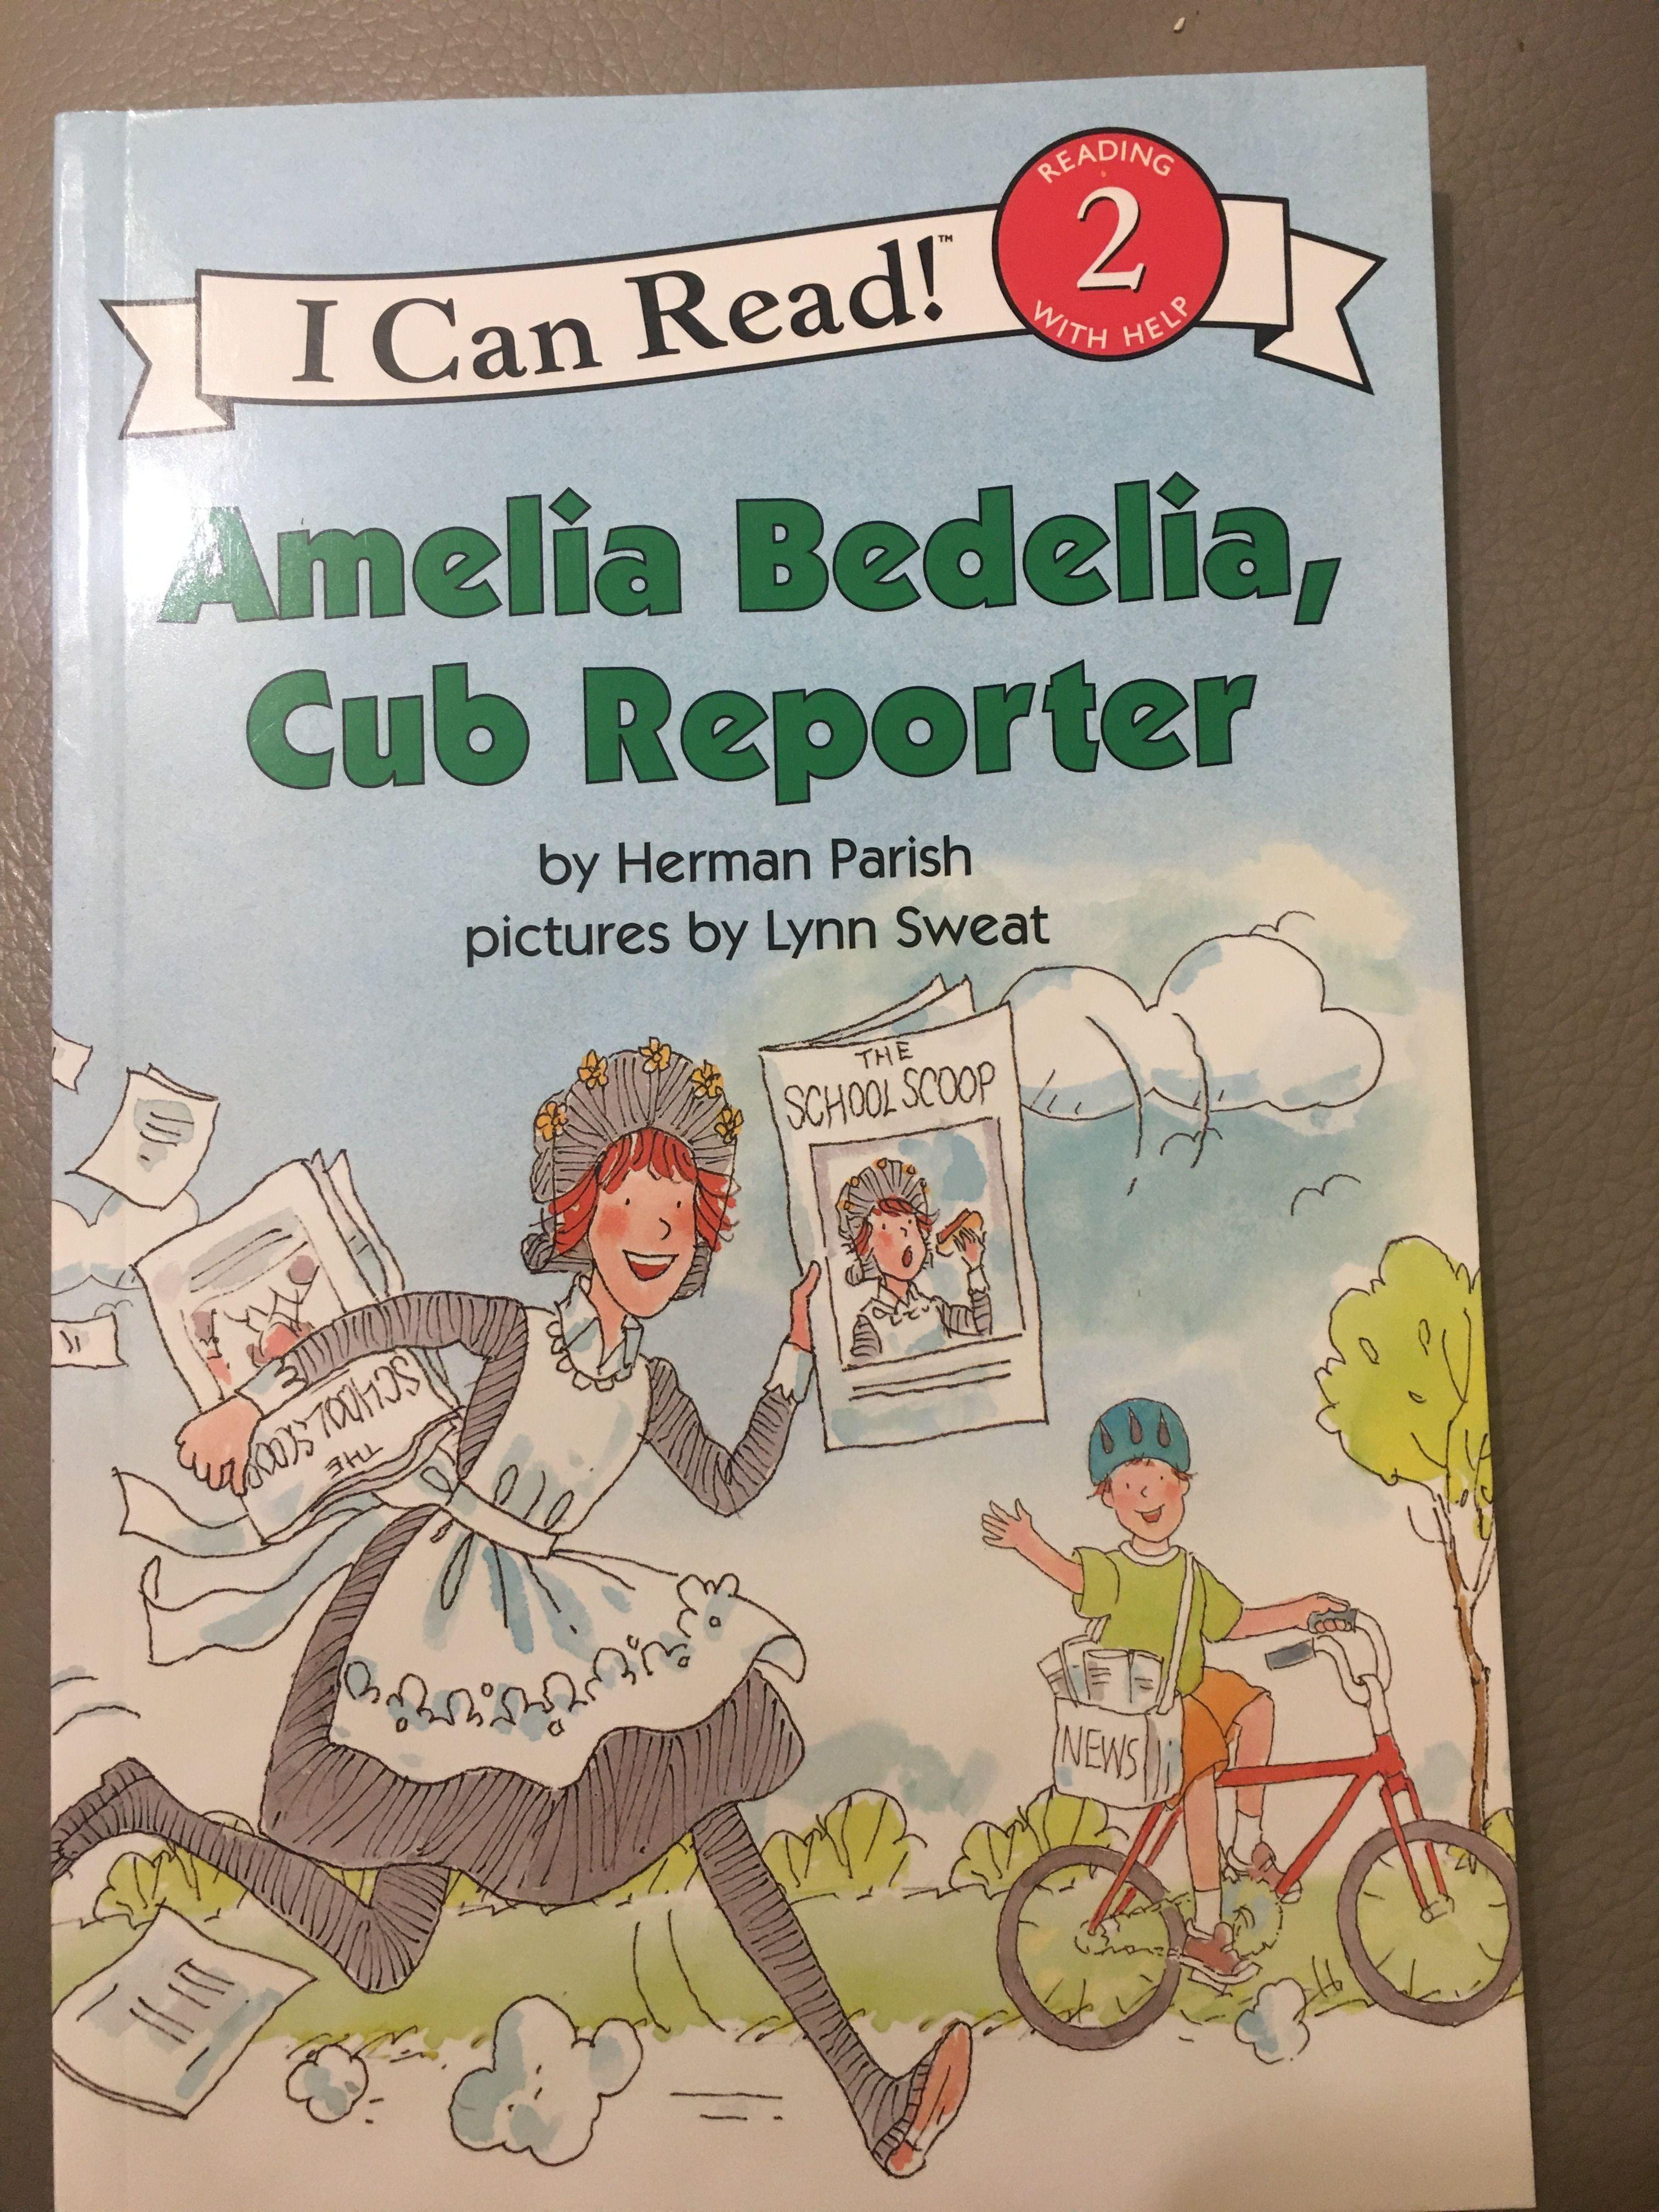 64p英文原版Amelia Bedelia, Cub Reporter (I Can Read Level 2)